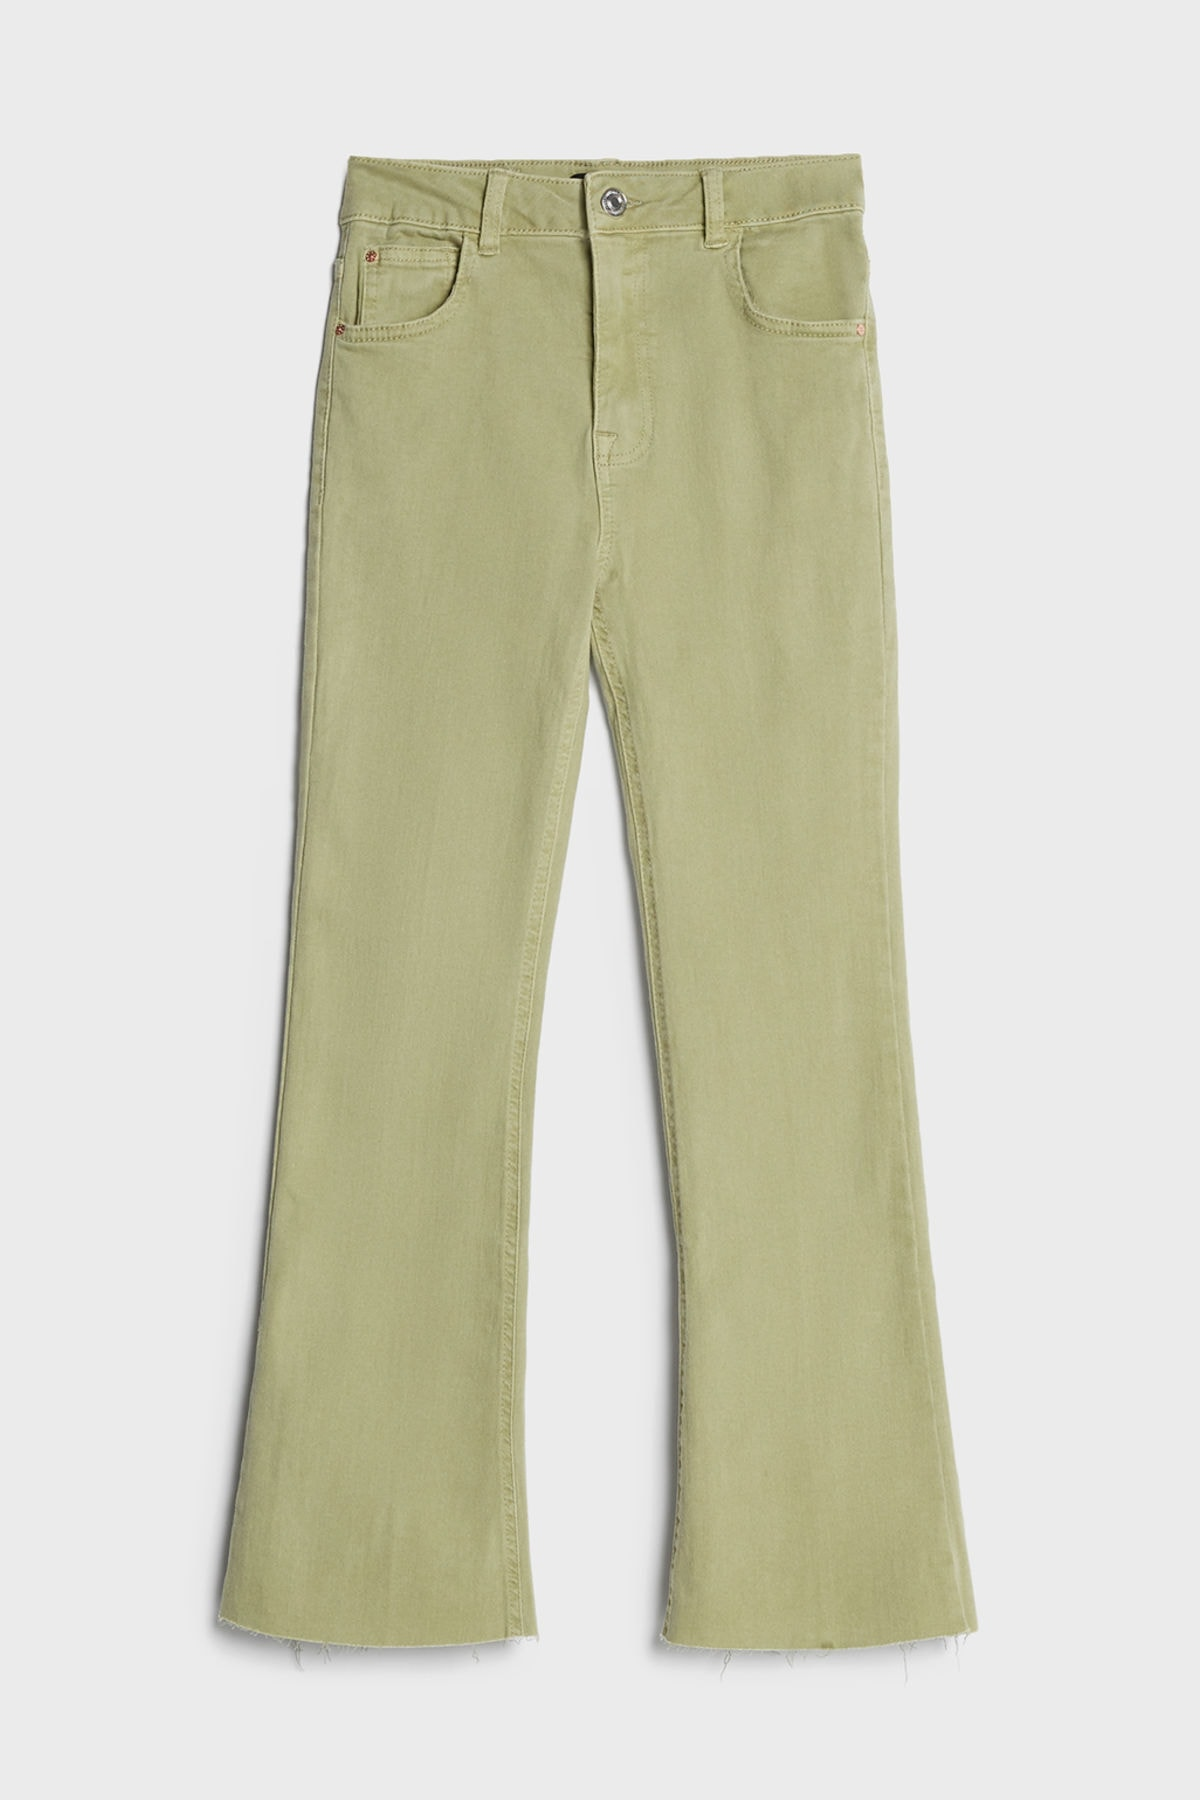 Bershka Kadın Haki Kick Flare Pantolon 05233019 2